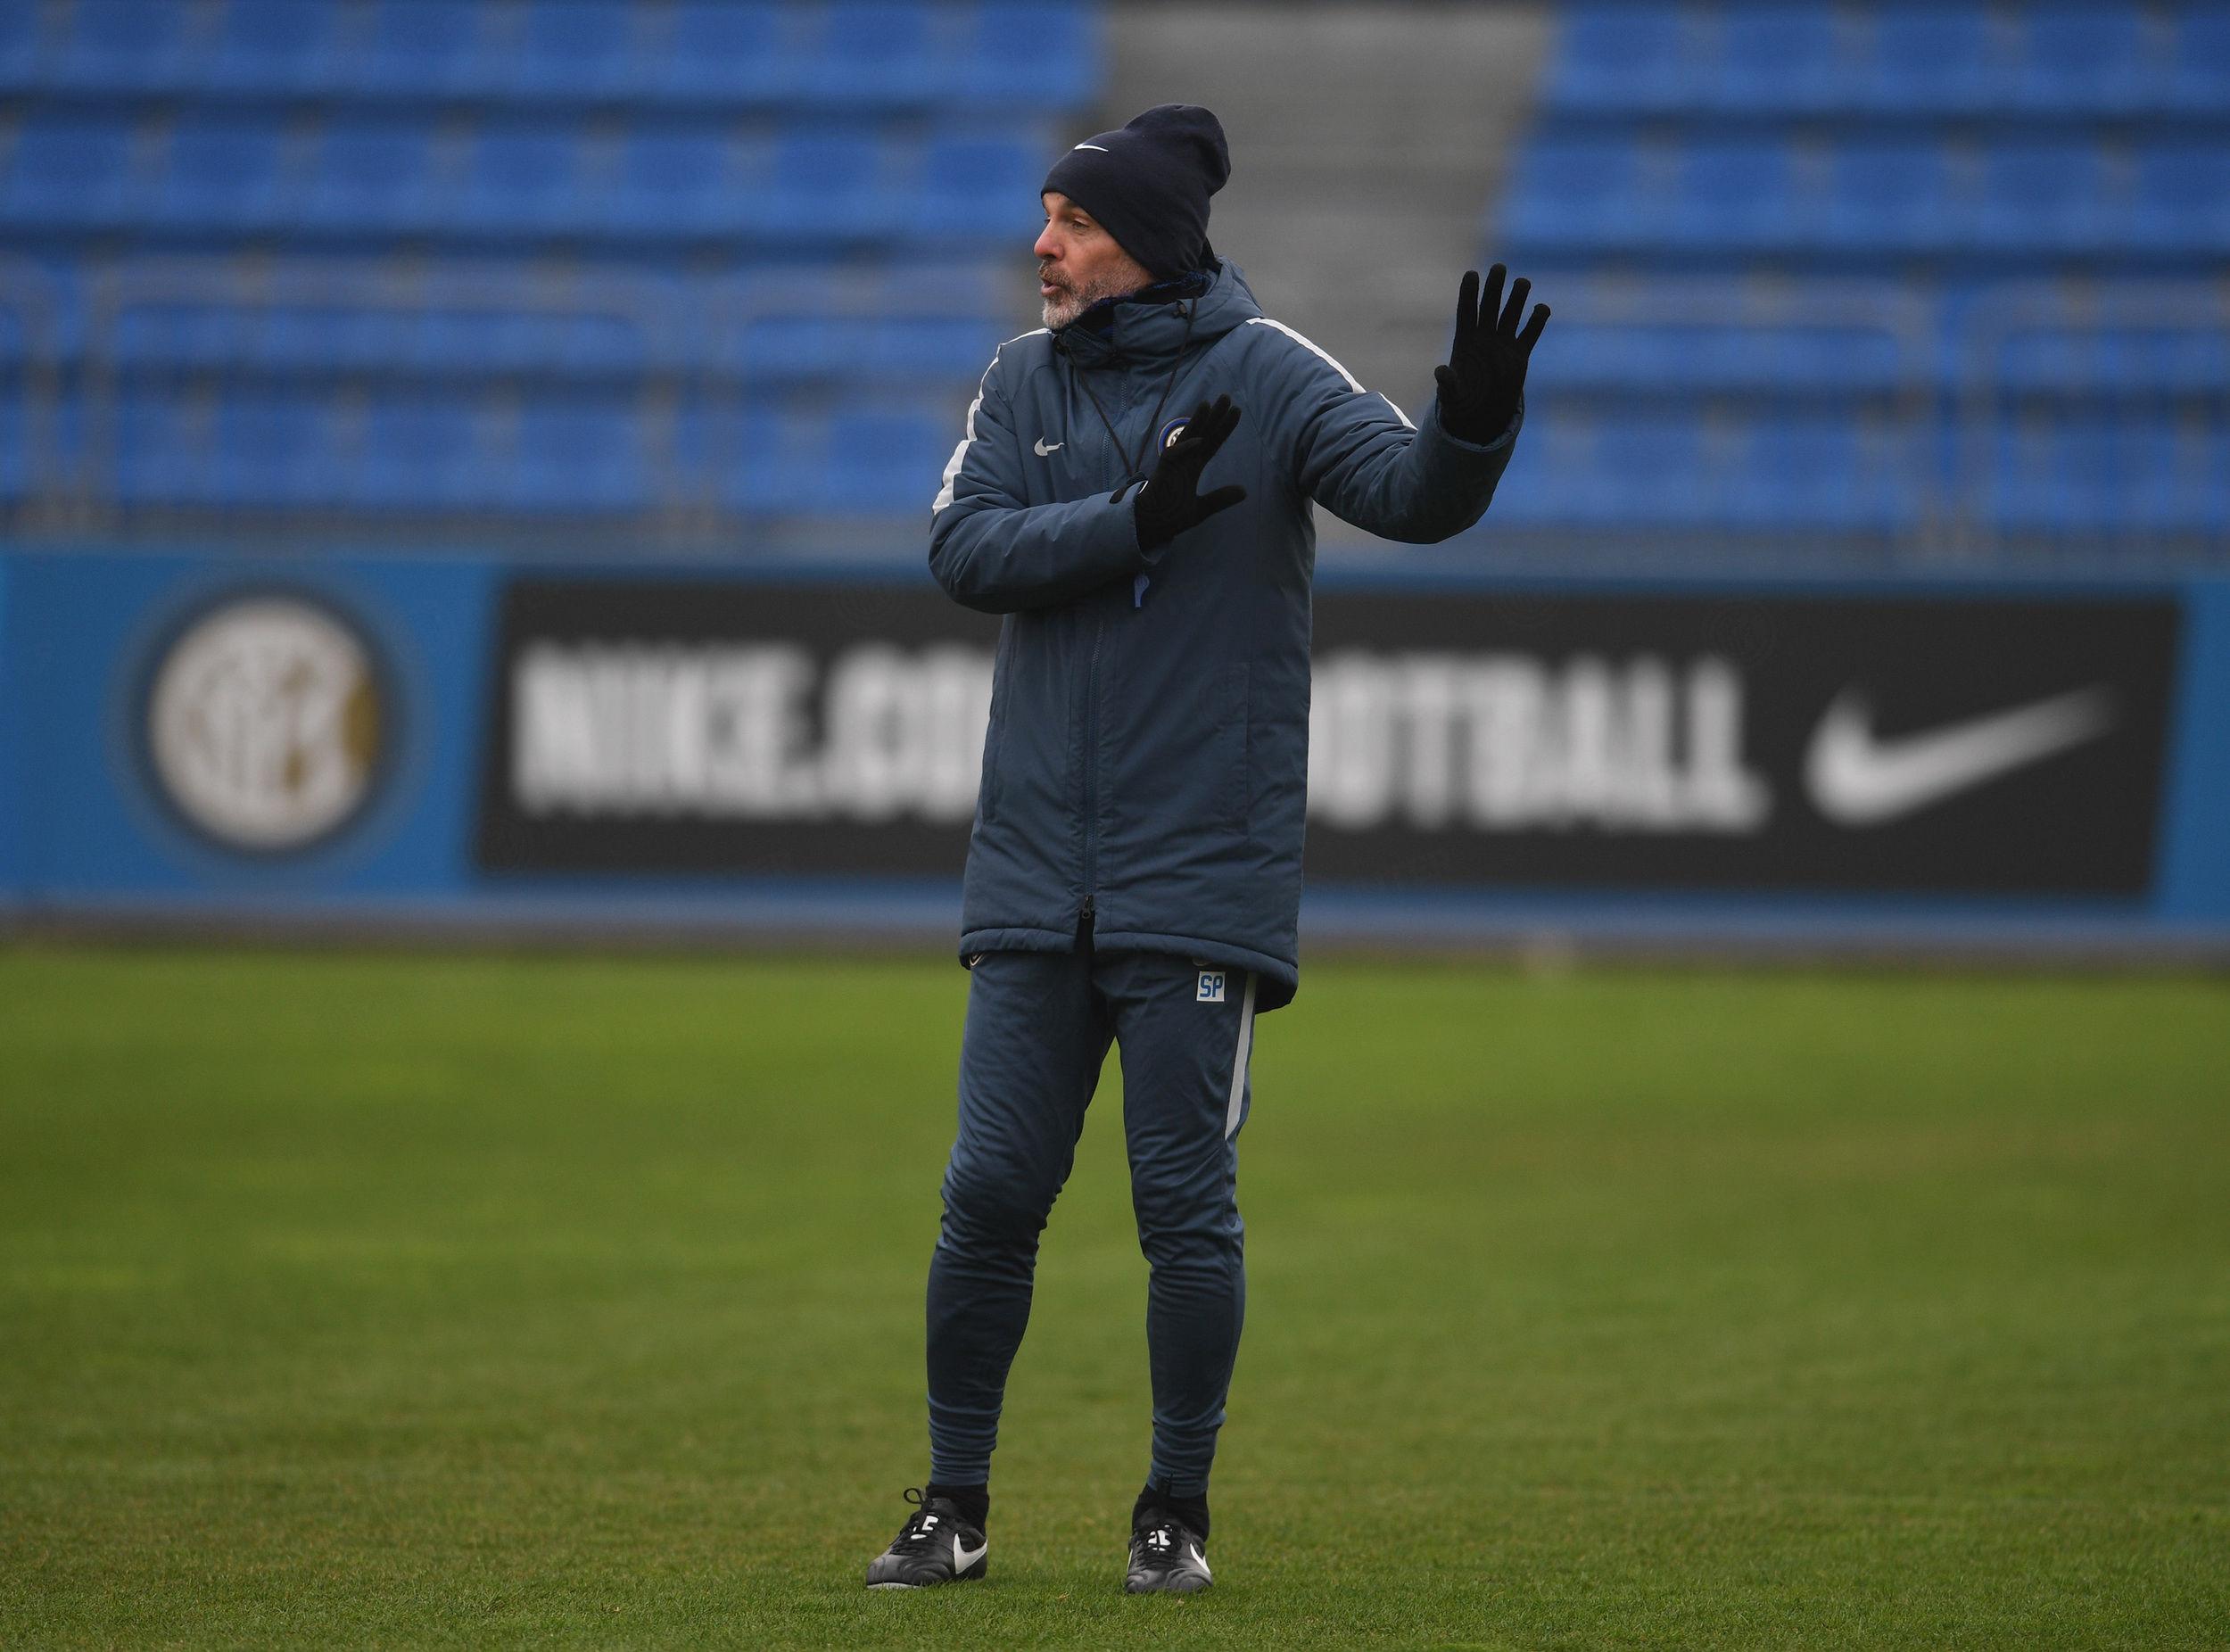 Latihan sore sebelum menghadapi Empoli